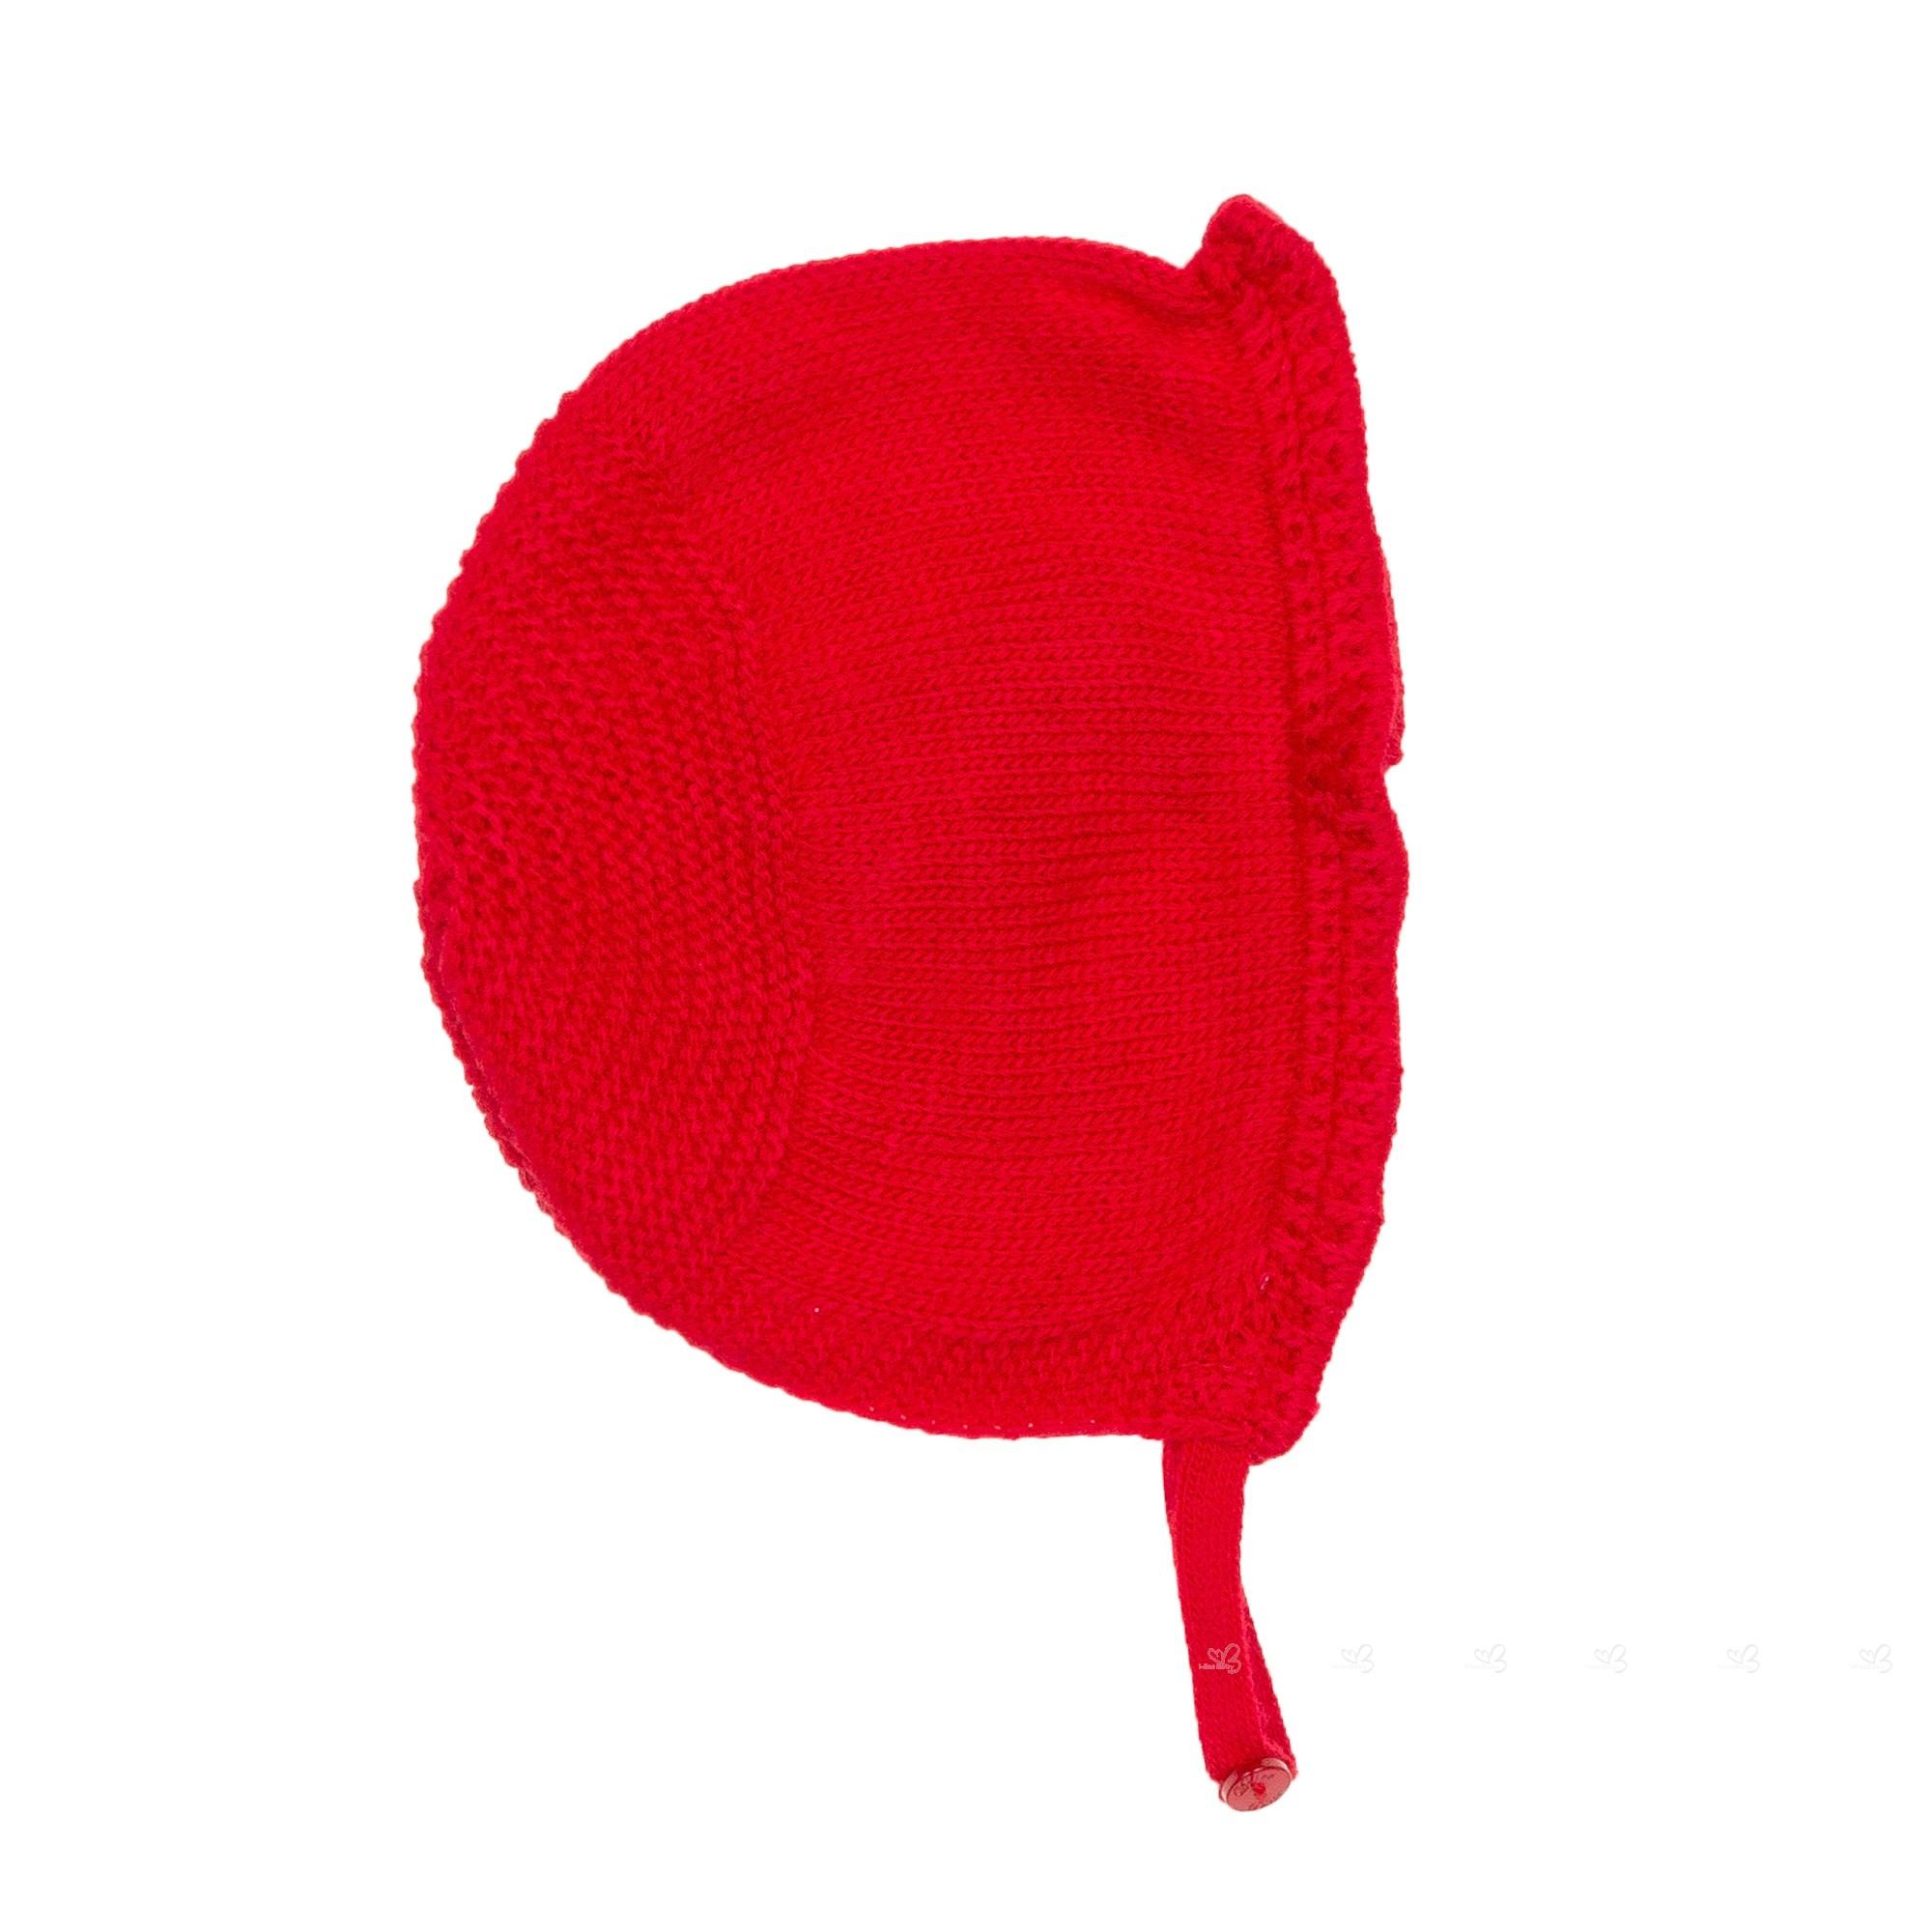 ed870548ce00 Dolce Petit Baby Girls Red Knitted Pram Coat   Bonnet Set